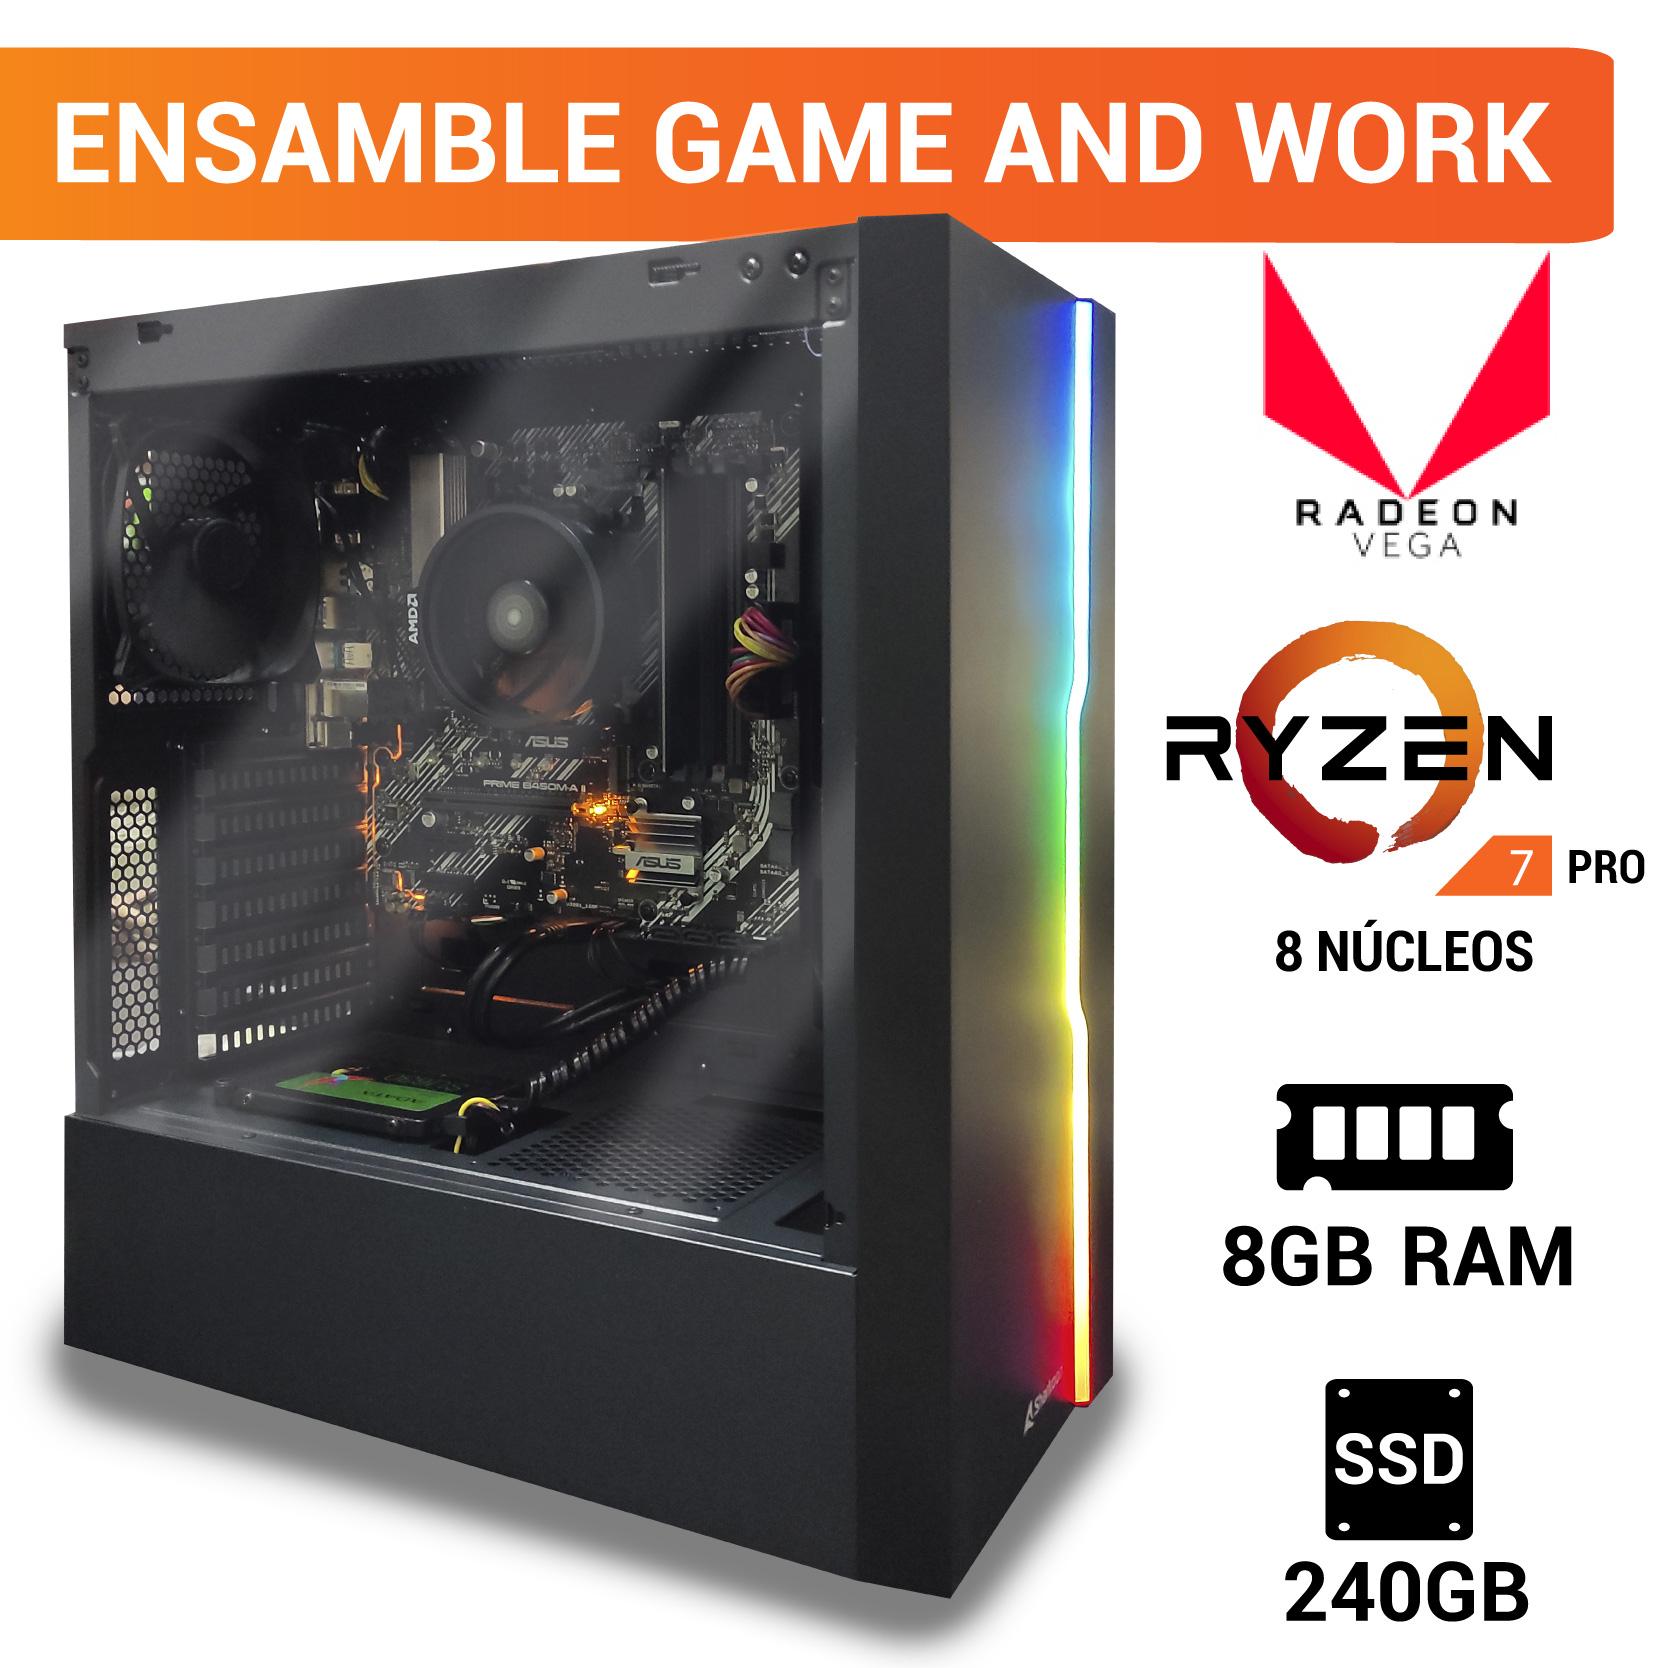 Digitalife: Ryzen 7 Pro 4750G - Asus Prime B450M-AII - 8 Gb Ram PC Ensamblada